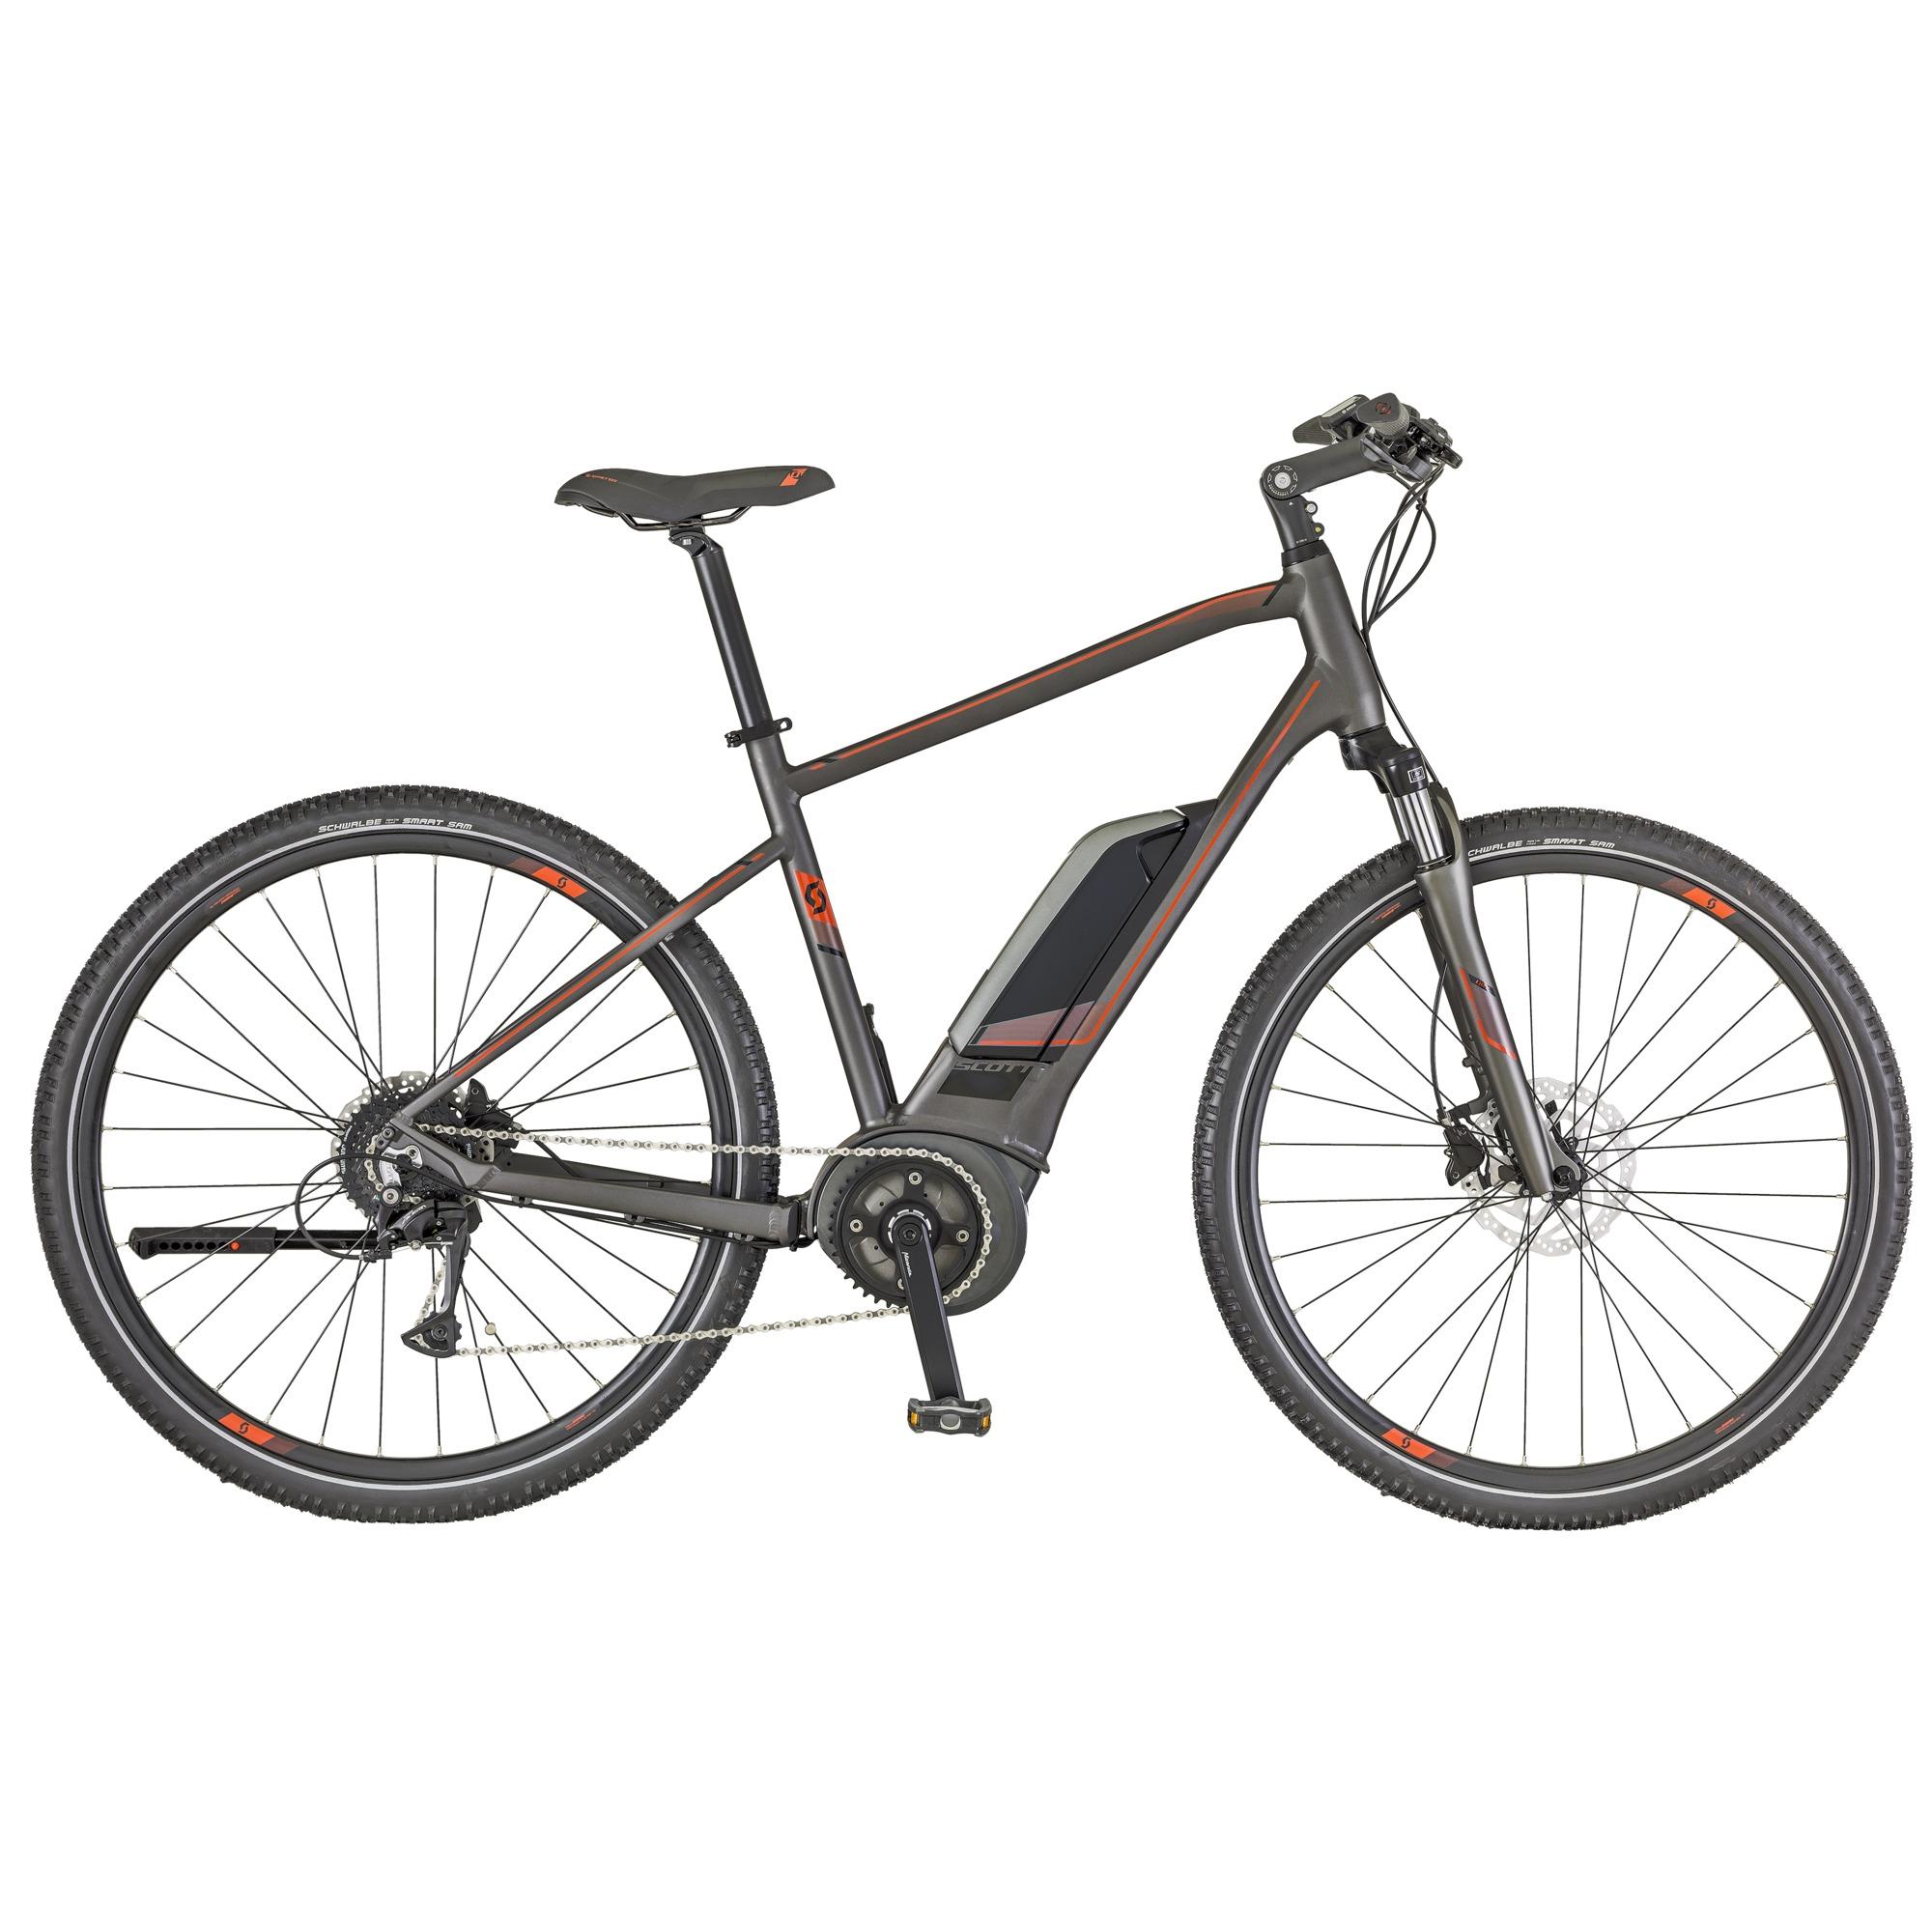 SCOTT E-Sub Cross 20 Herrenfahrrad L - Fahrrad online kaufen | Online Shop Bike Profis